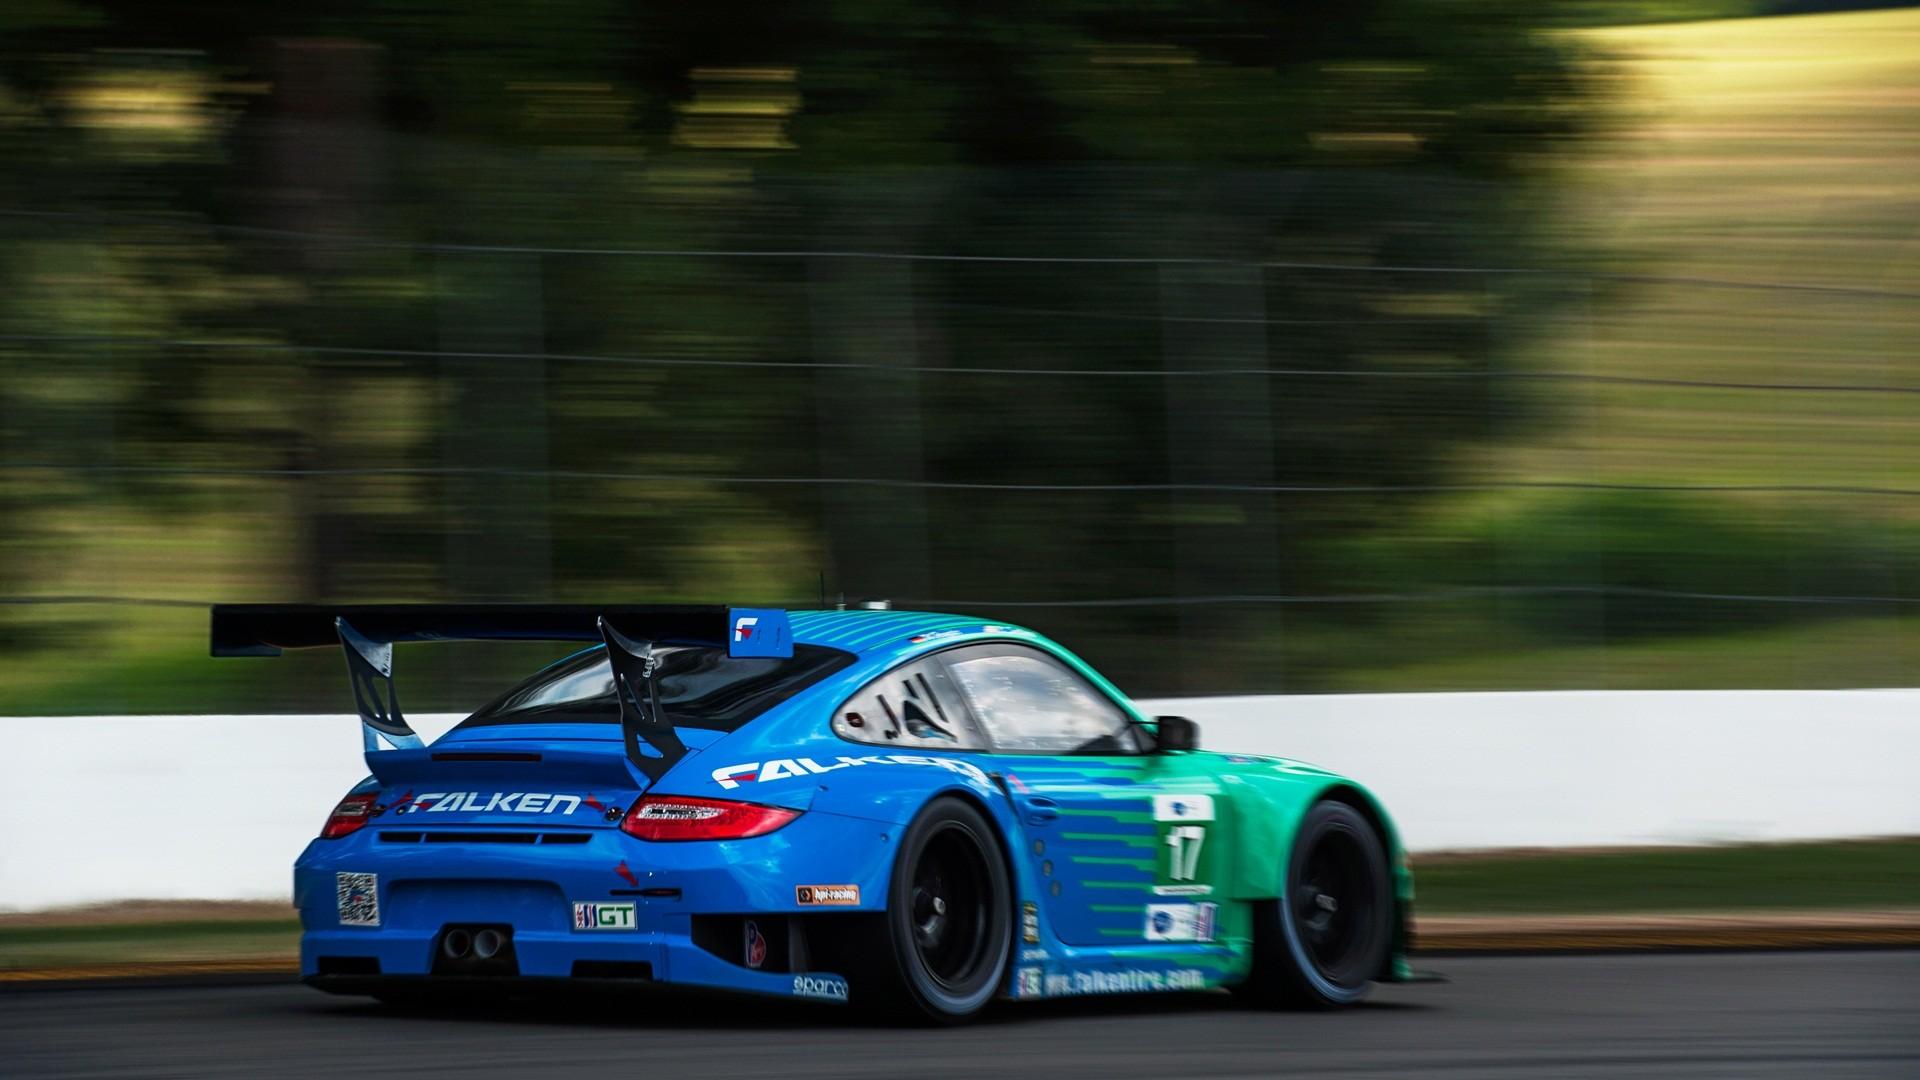 Porsche cars racing cars race tracks wallpaper 1920x1080 192914 1920x1080